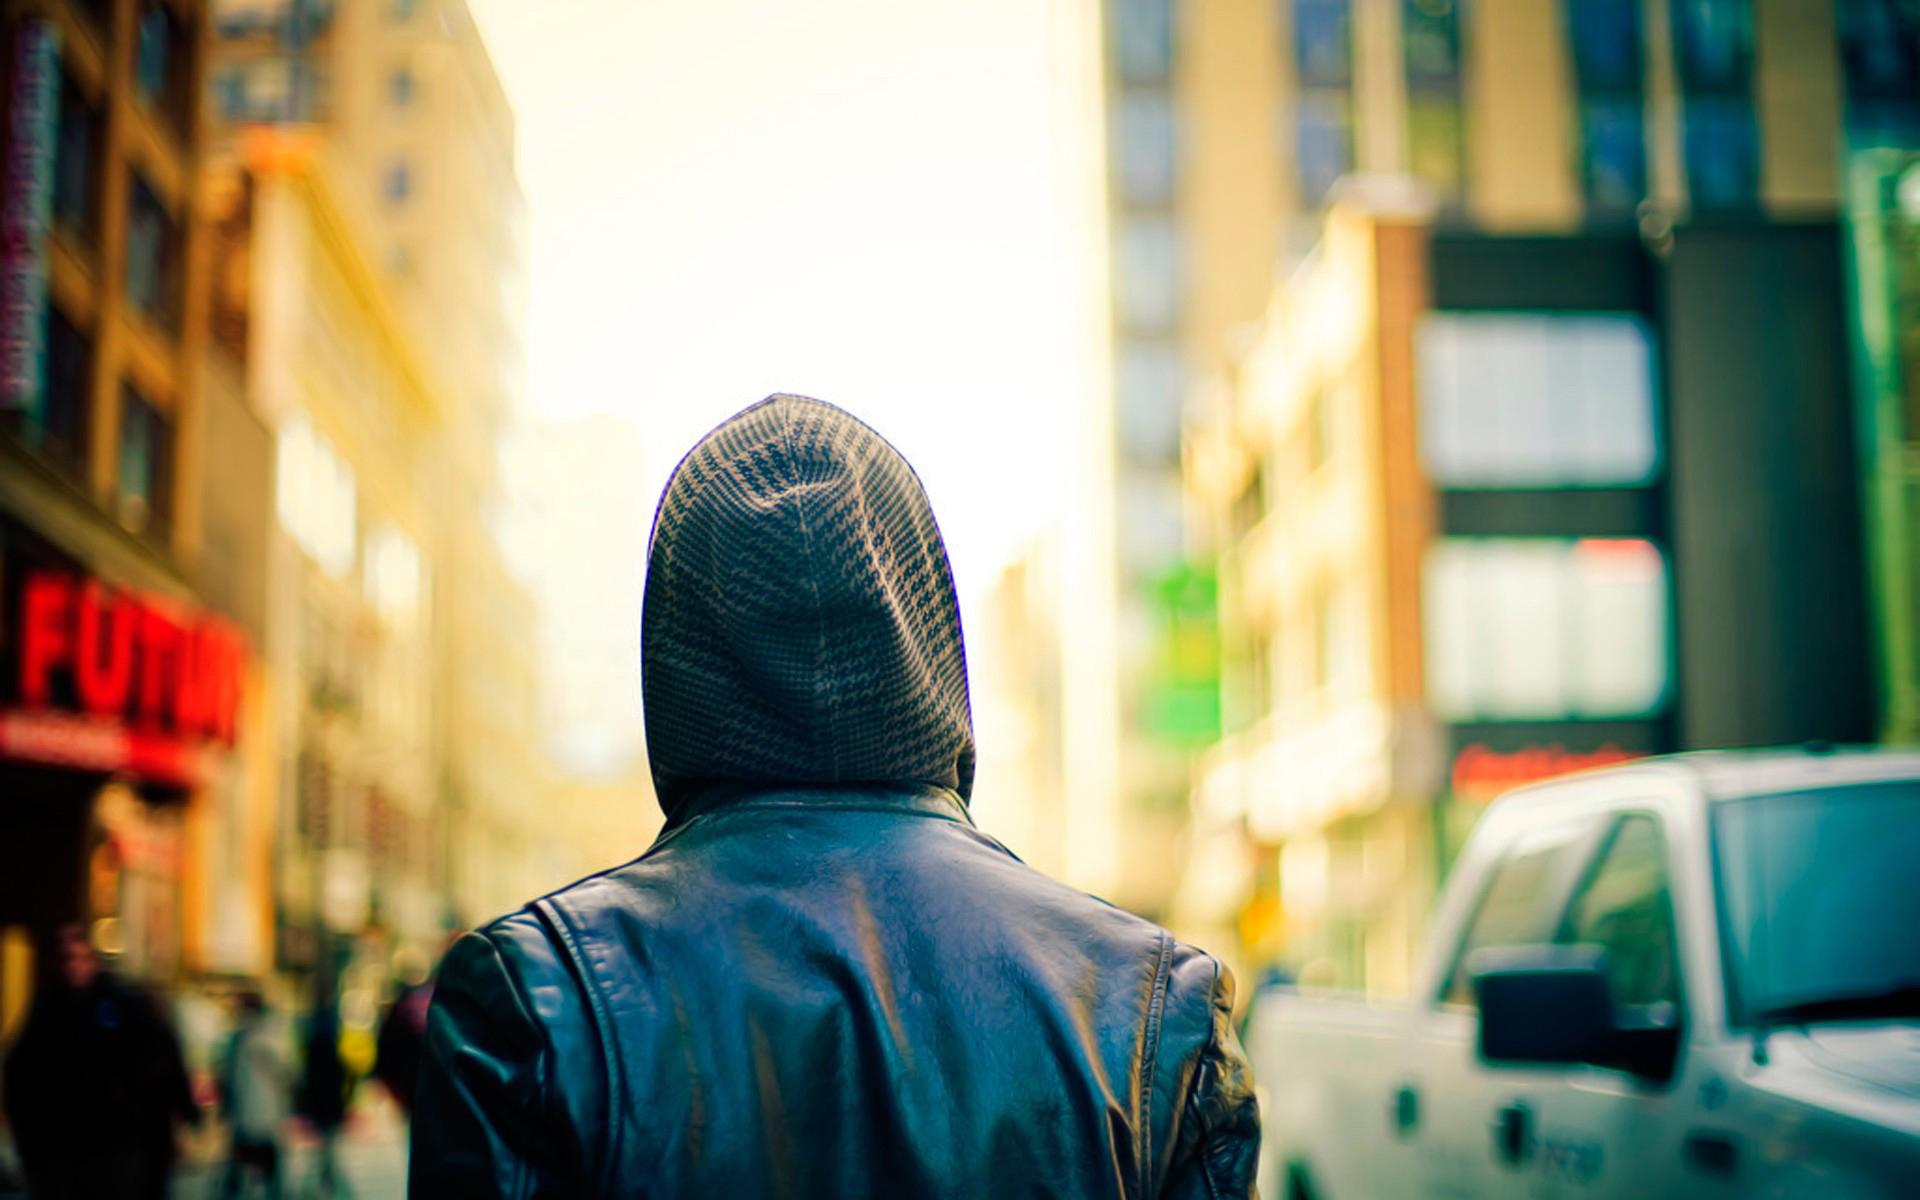 человек, капюшон, улица